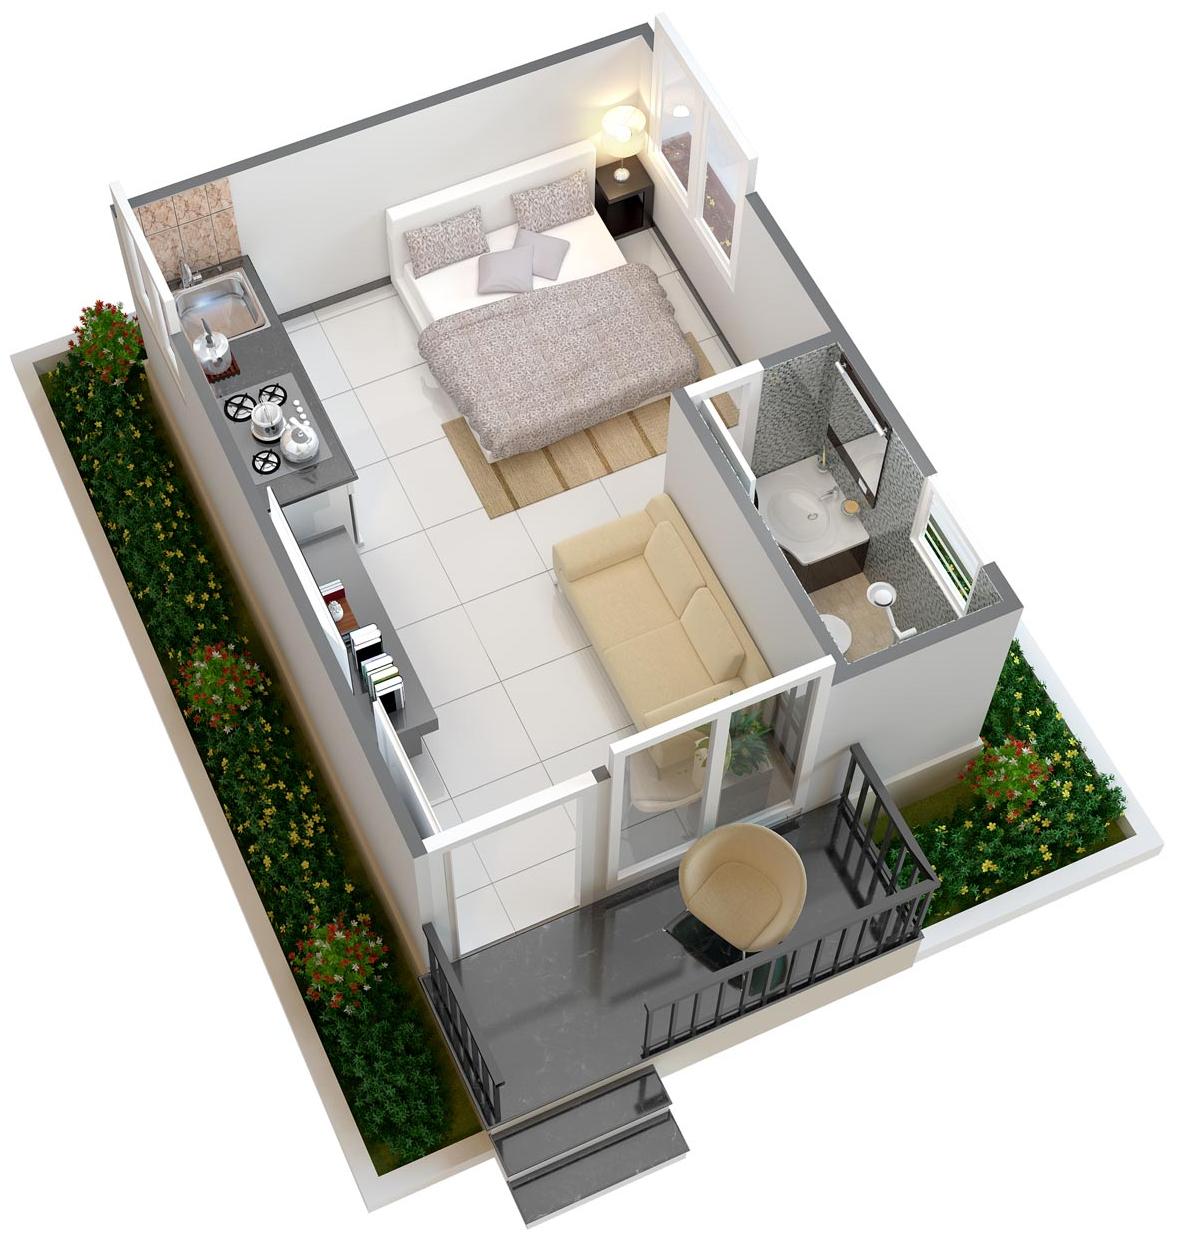 Manju hrudhya farms in tindivanam pondicherry price for 350 sq ft house